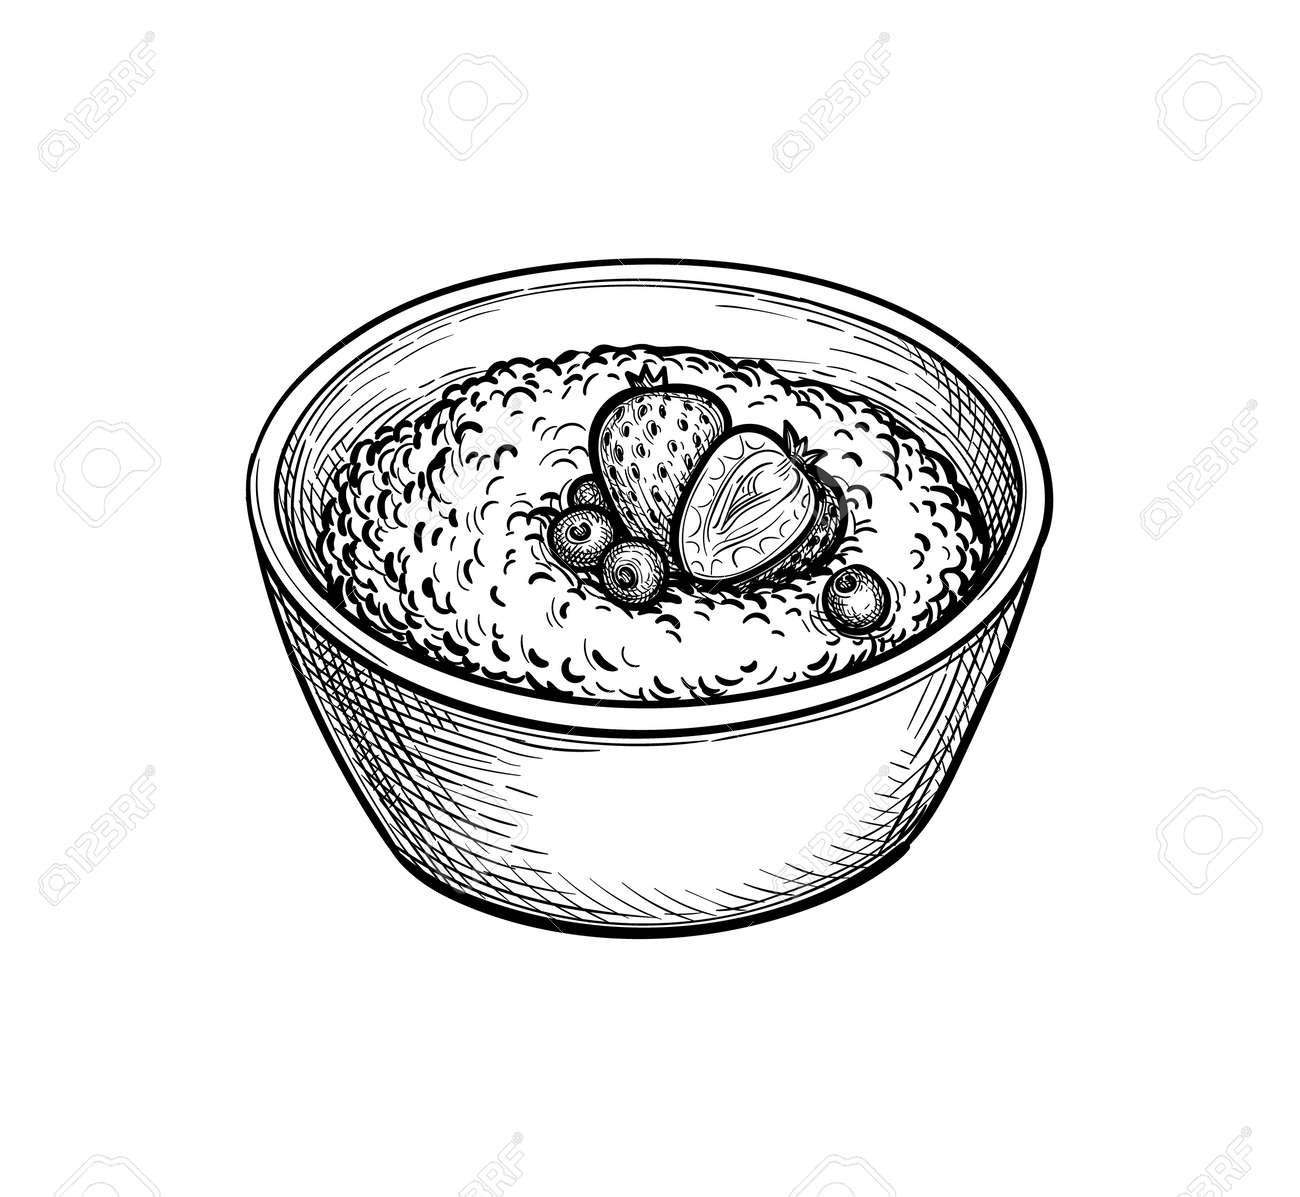 Ink sketch of oatmeal. - 169815932